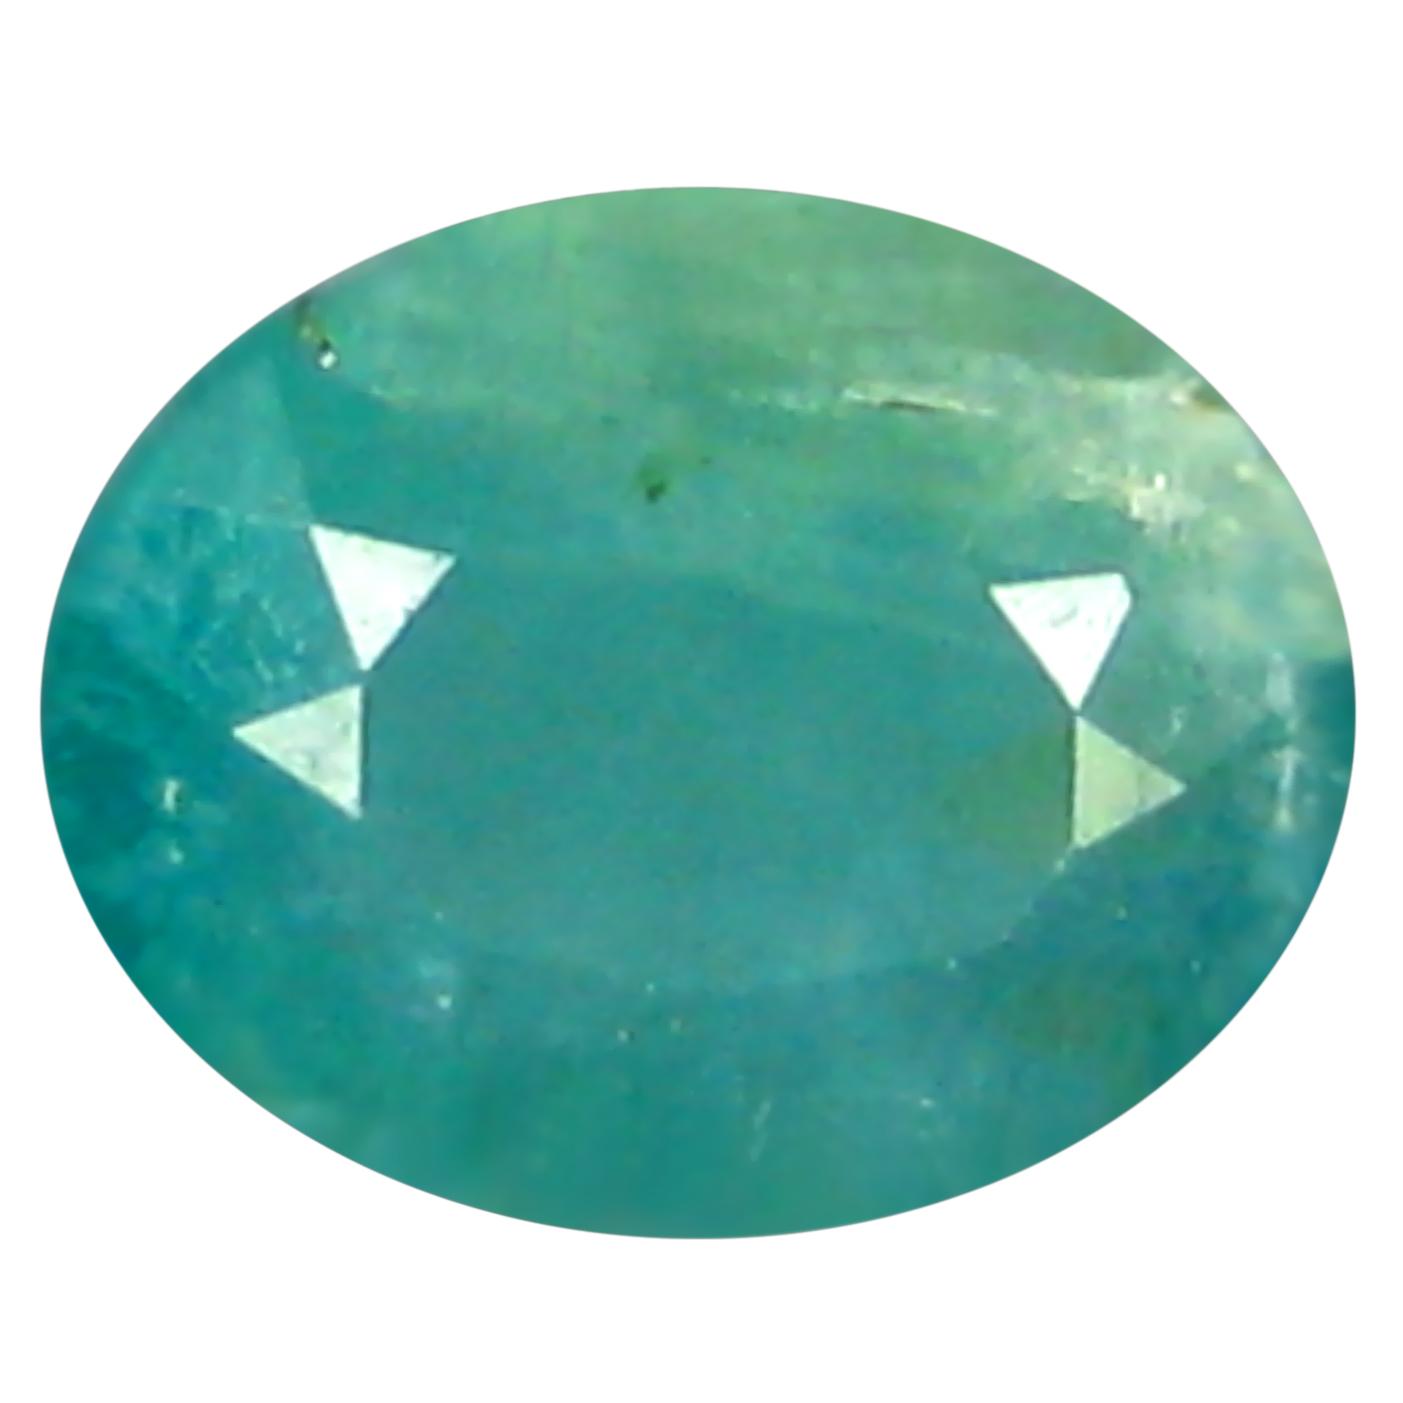 0.31 ct  Terrific Oval Shape (5 x 4 mm) Bluish Green Grandidierite Natural Gemstone